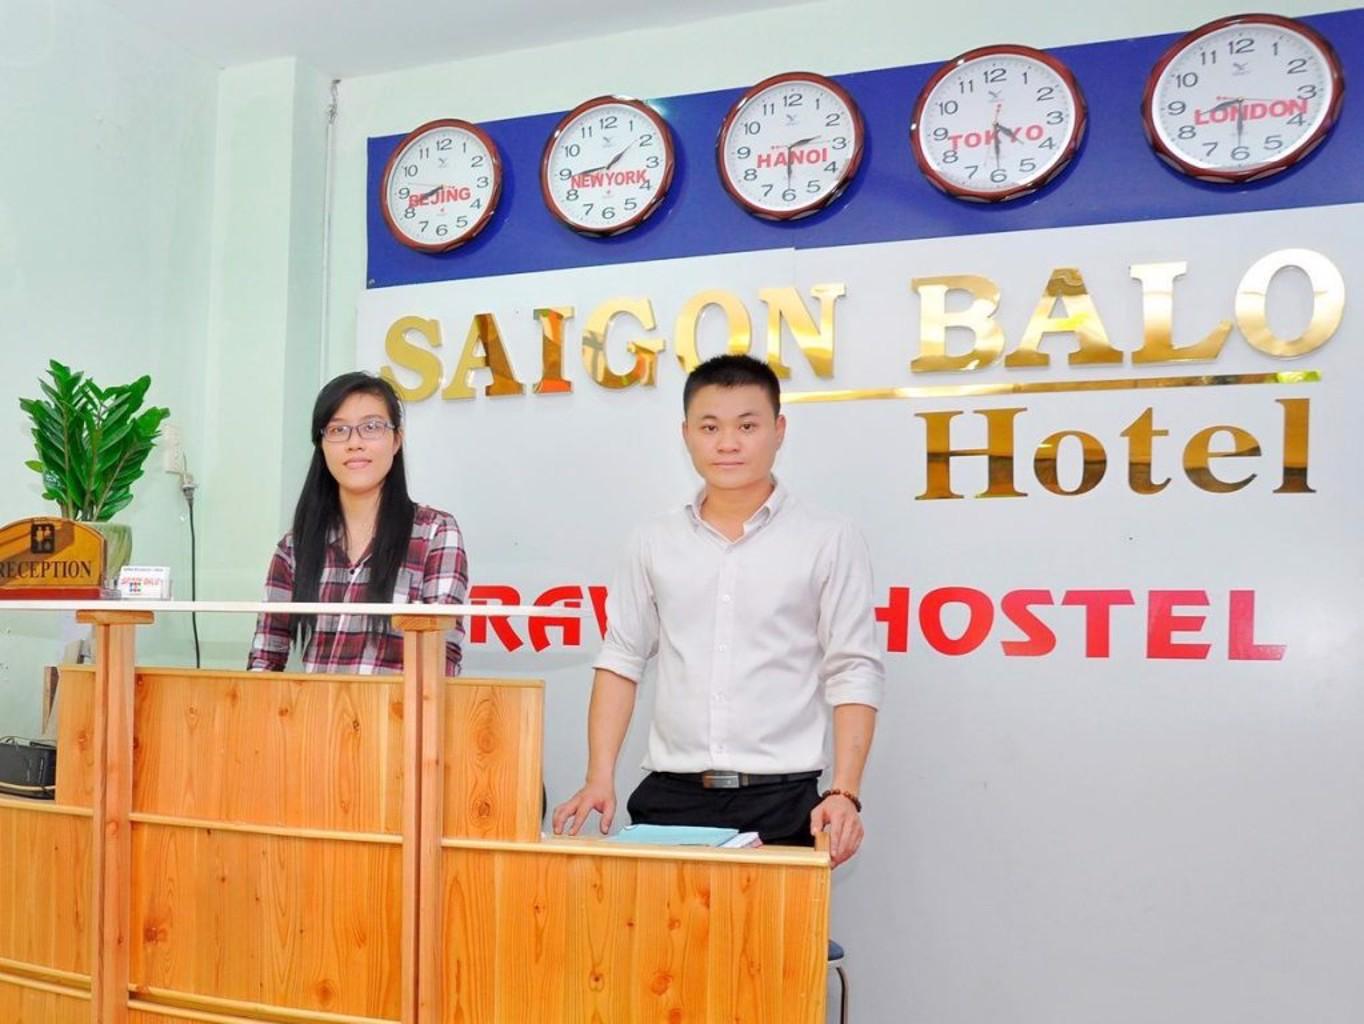 Gallery image of Saigon Balo Hotel